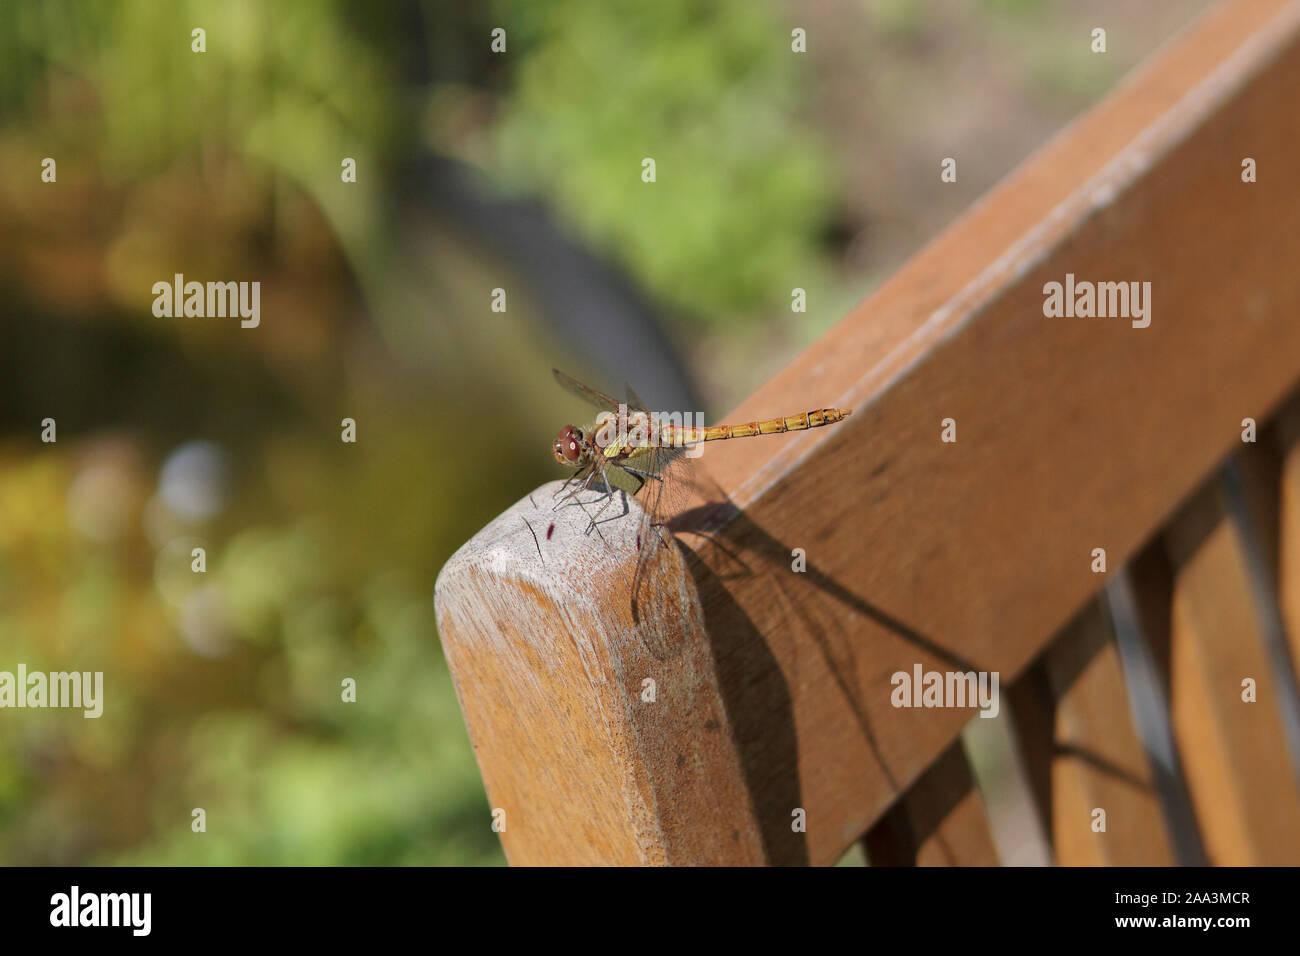 Common darter dragonfly (Sympetrum striolatum) on a chair, England, United Kingdom Stock Photo